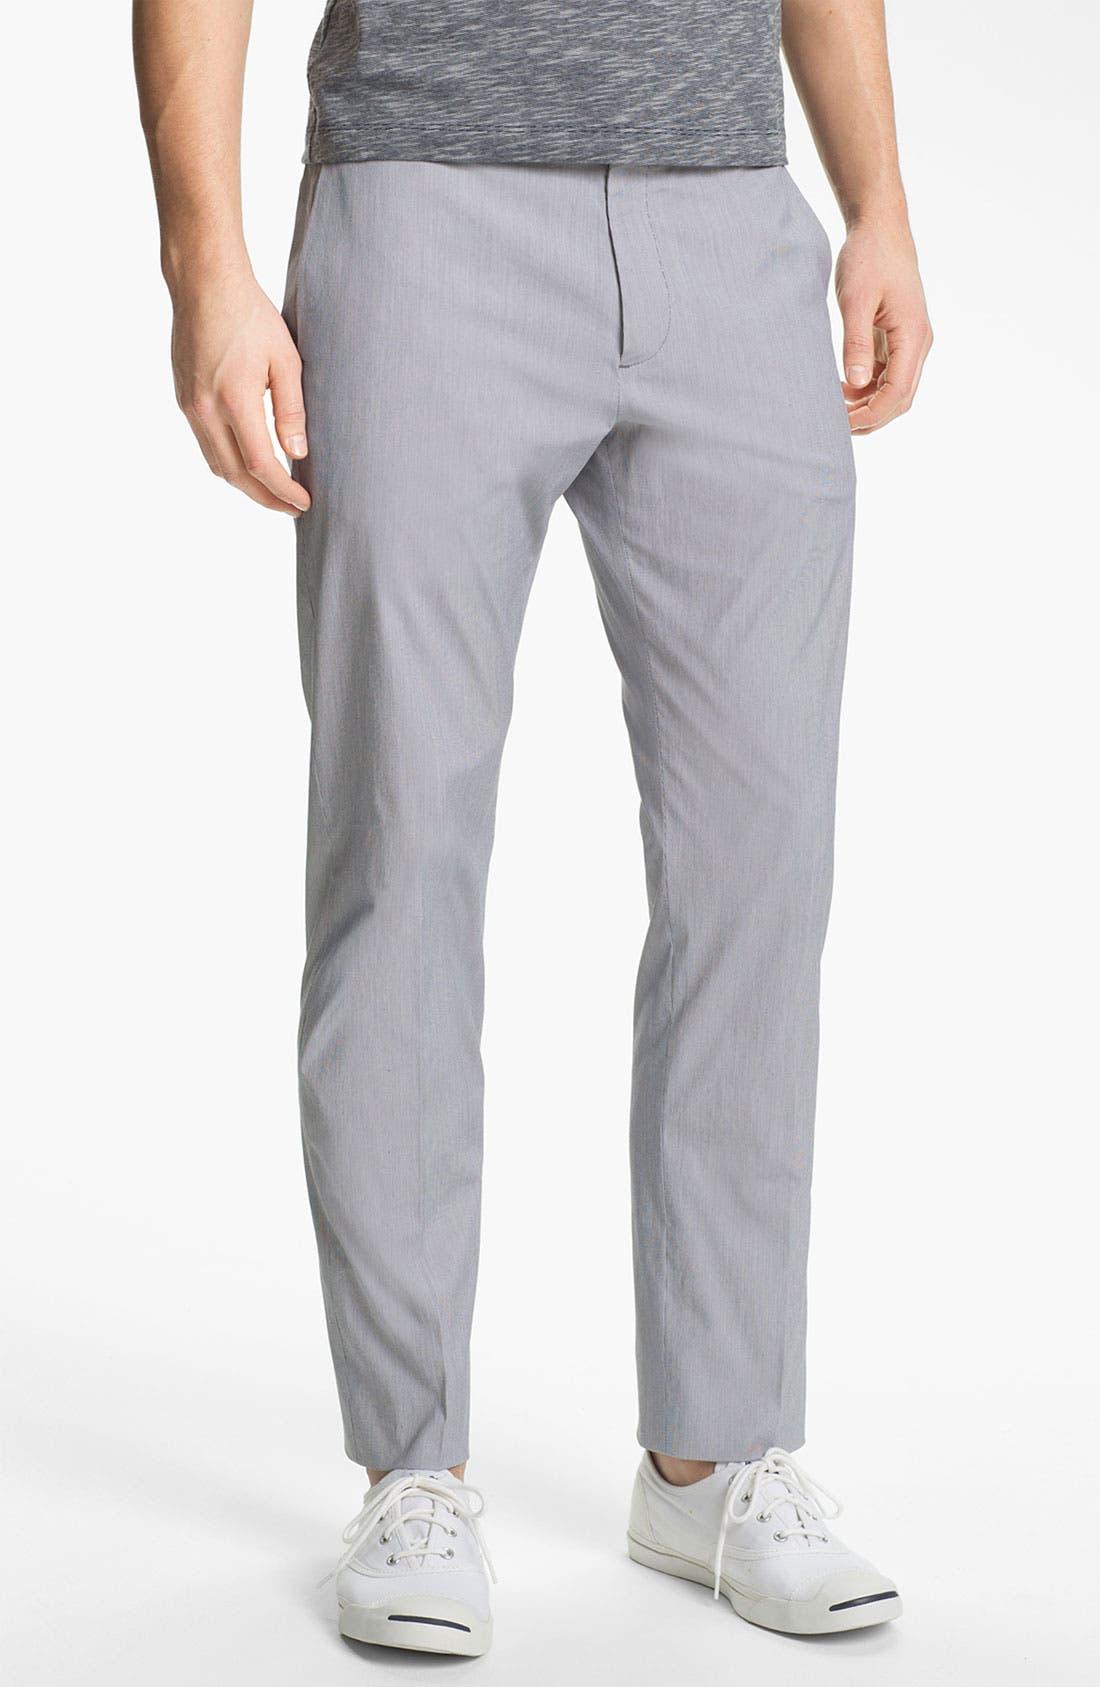 Alternate Image 1 Selected - Theory 'Jake W Shirwin' Slim Flat Front Pants